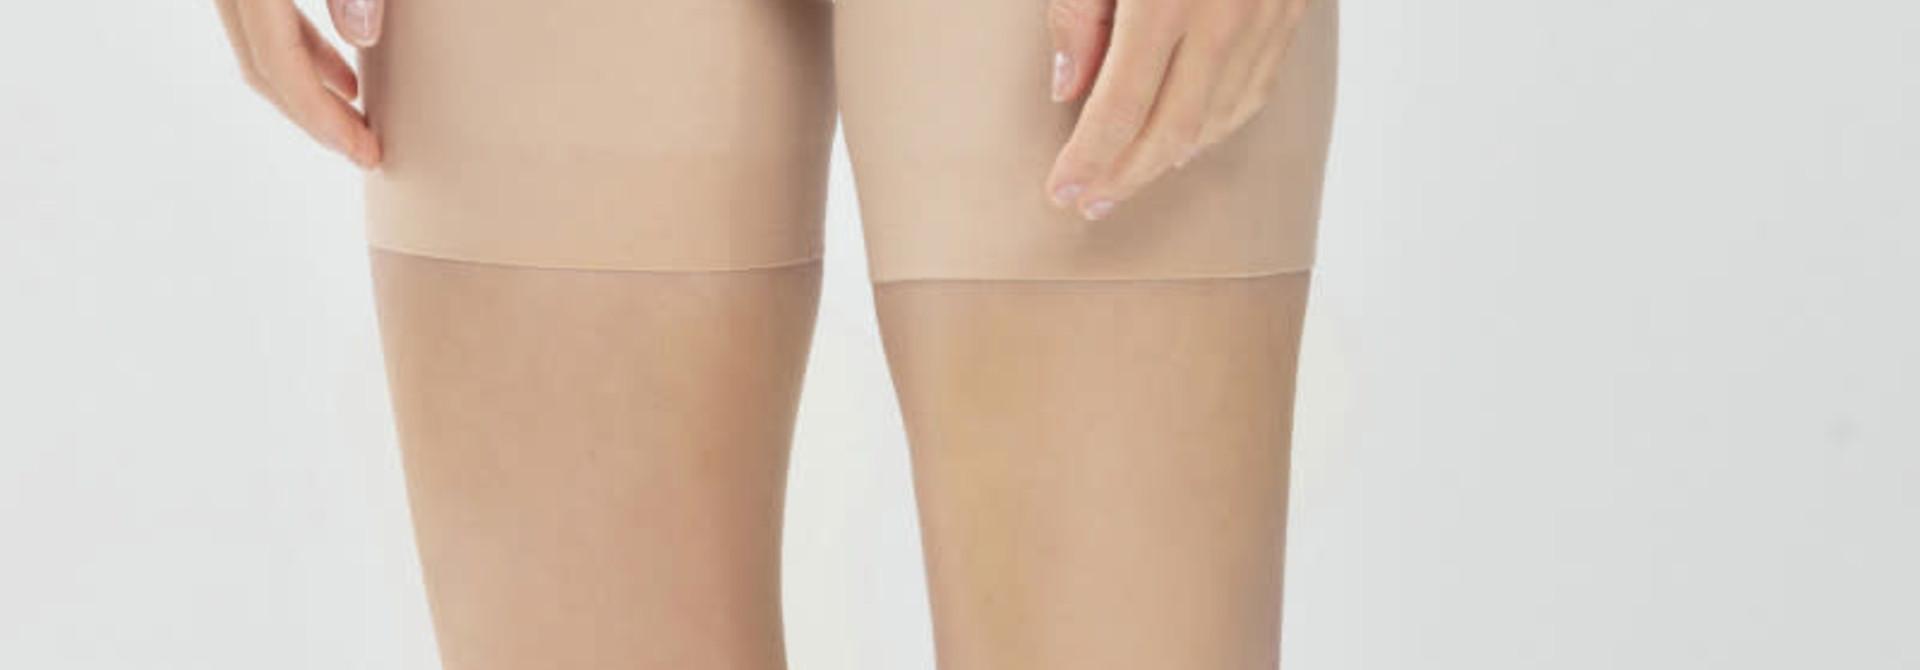 Corrigerende panty Nova 47345 - huid